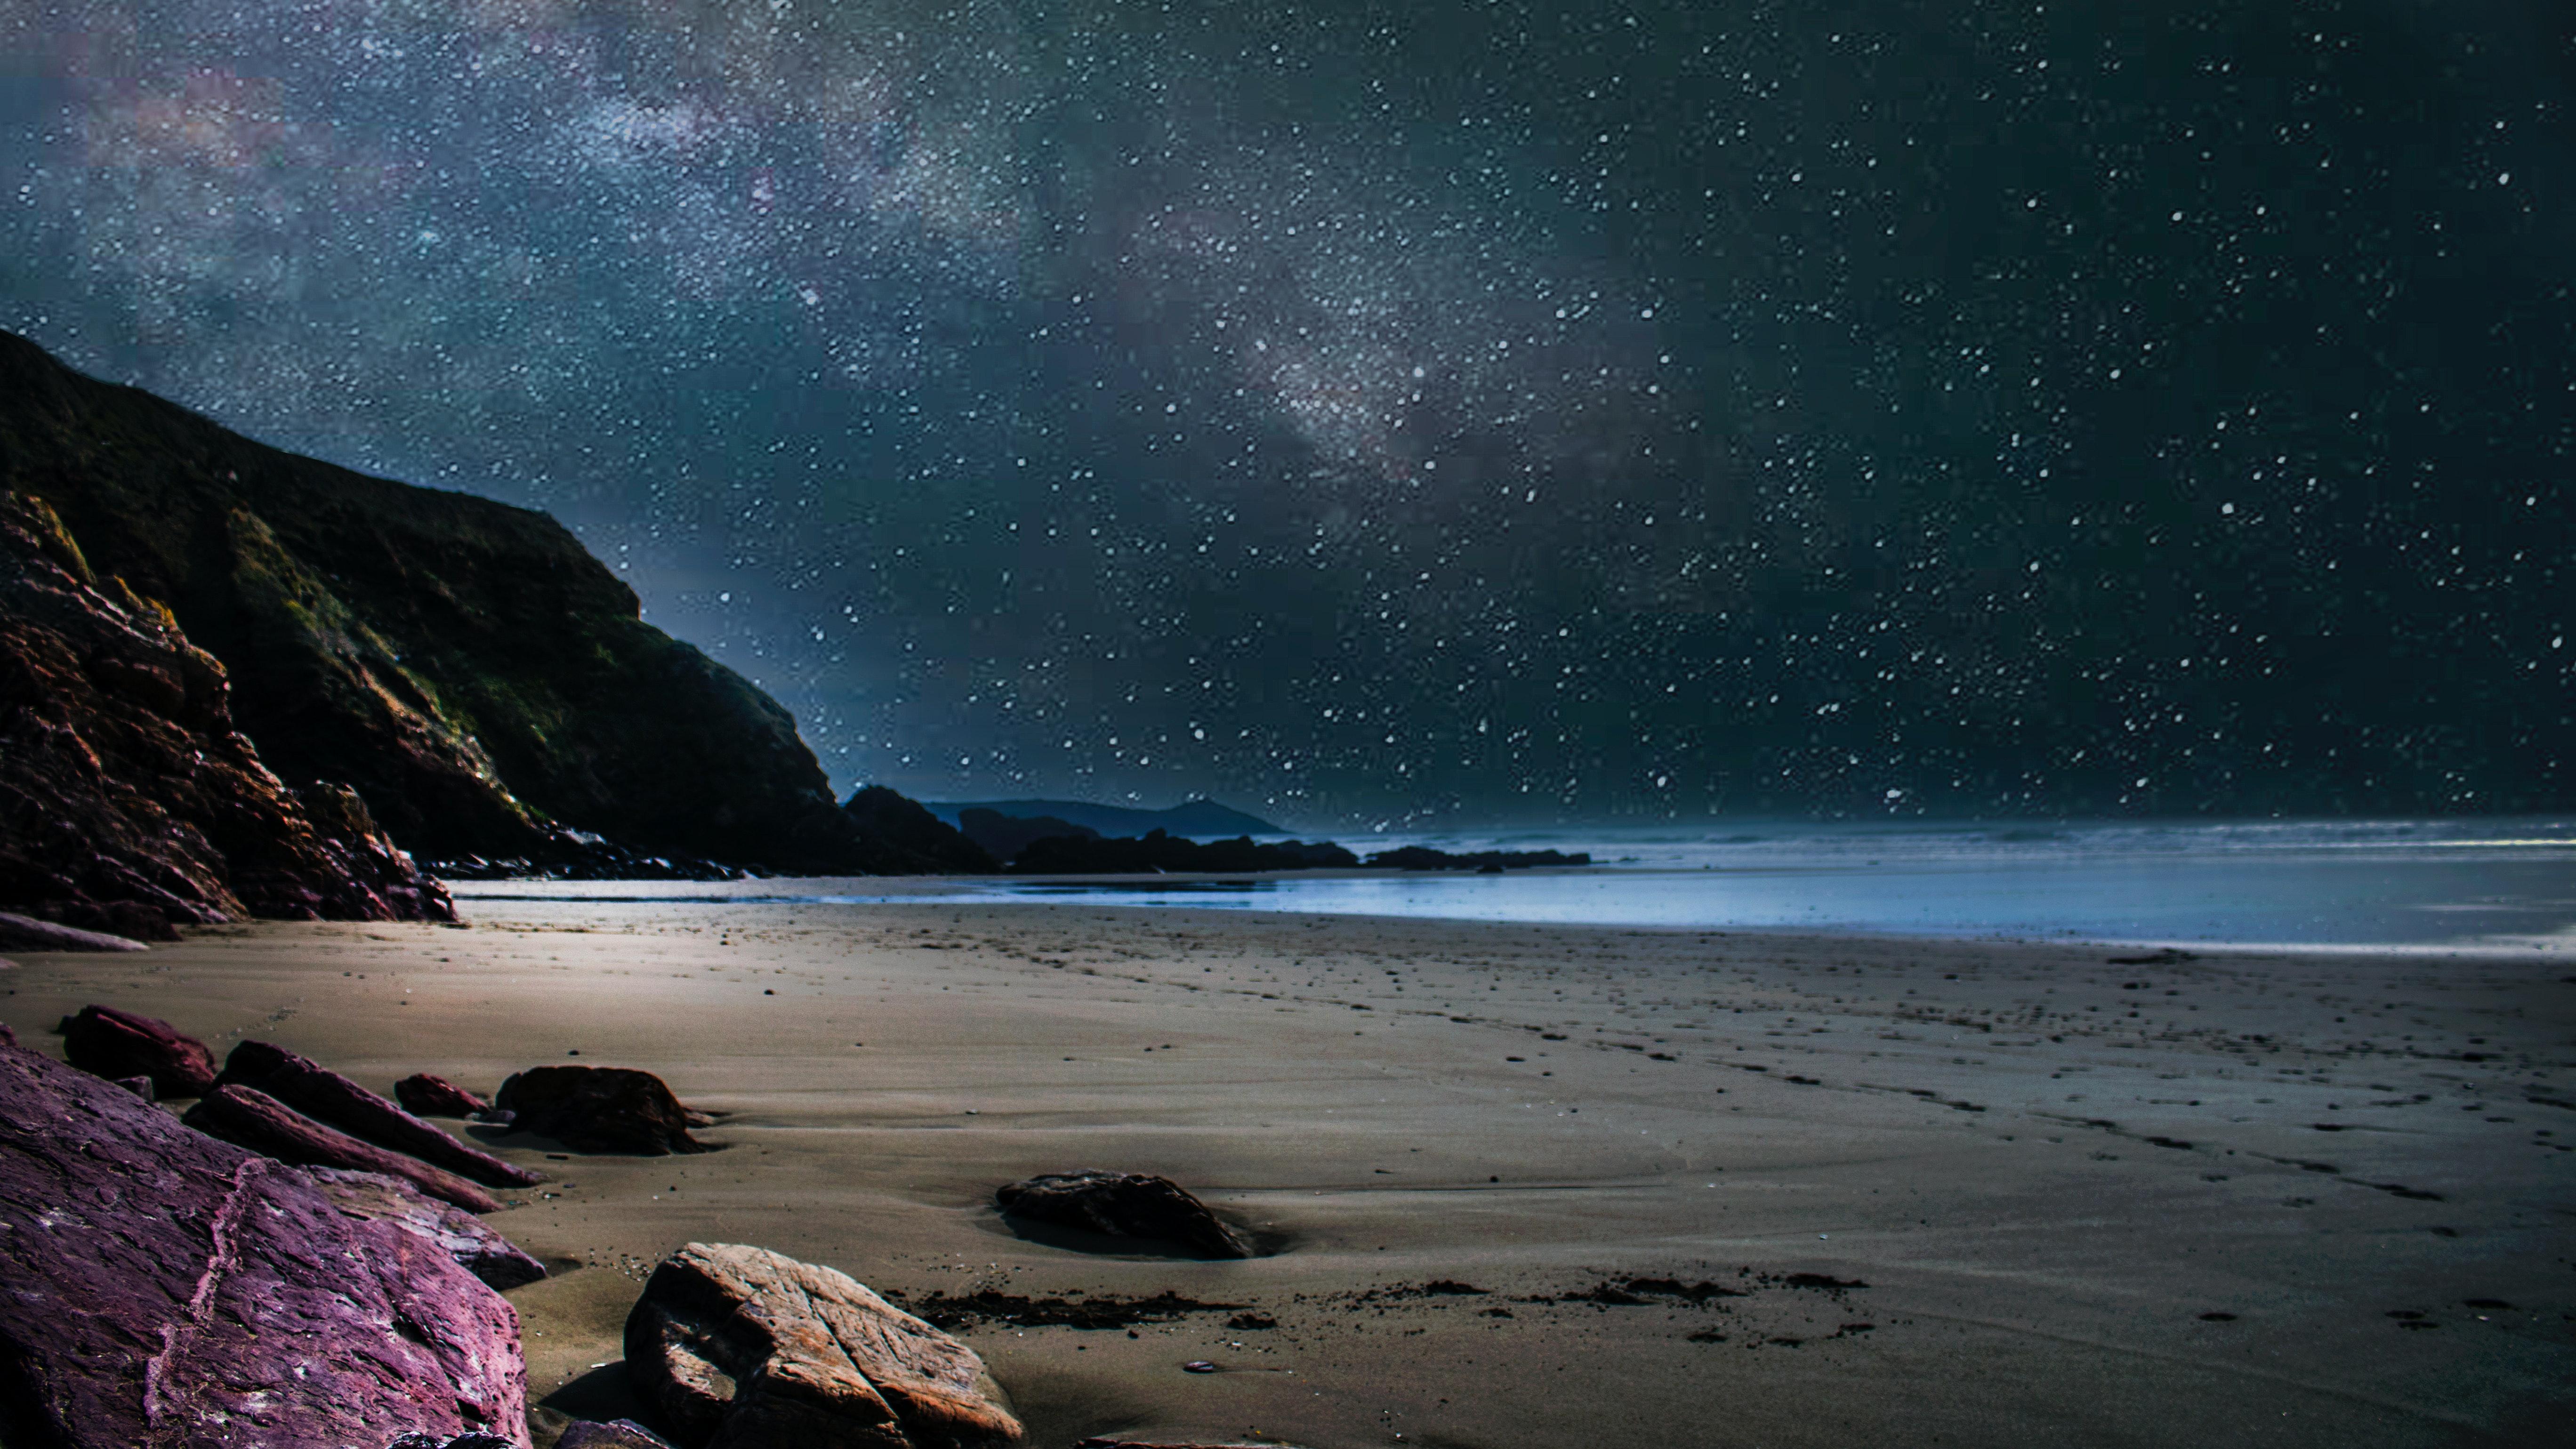 Breathtaking Night Images Pexels Free Stock Photos